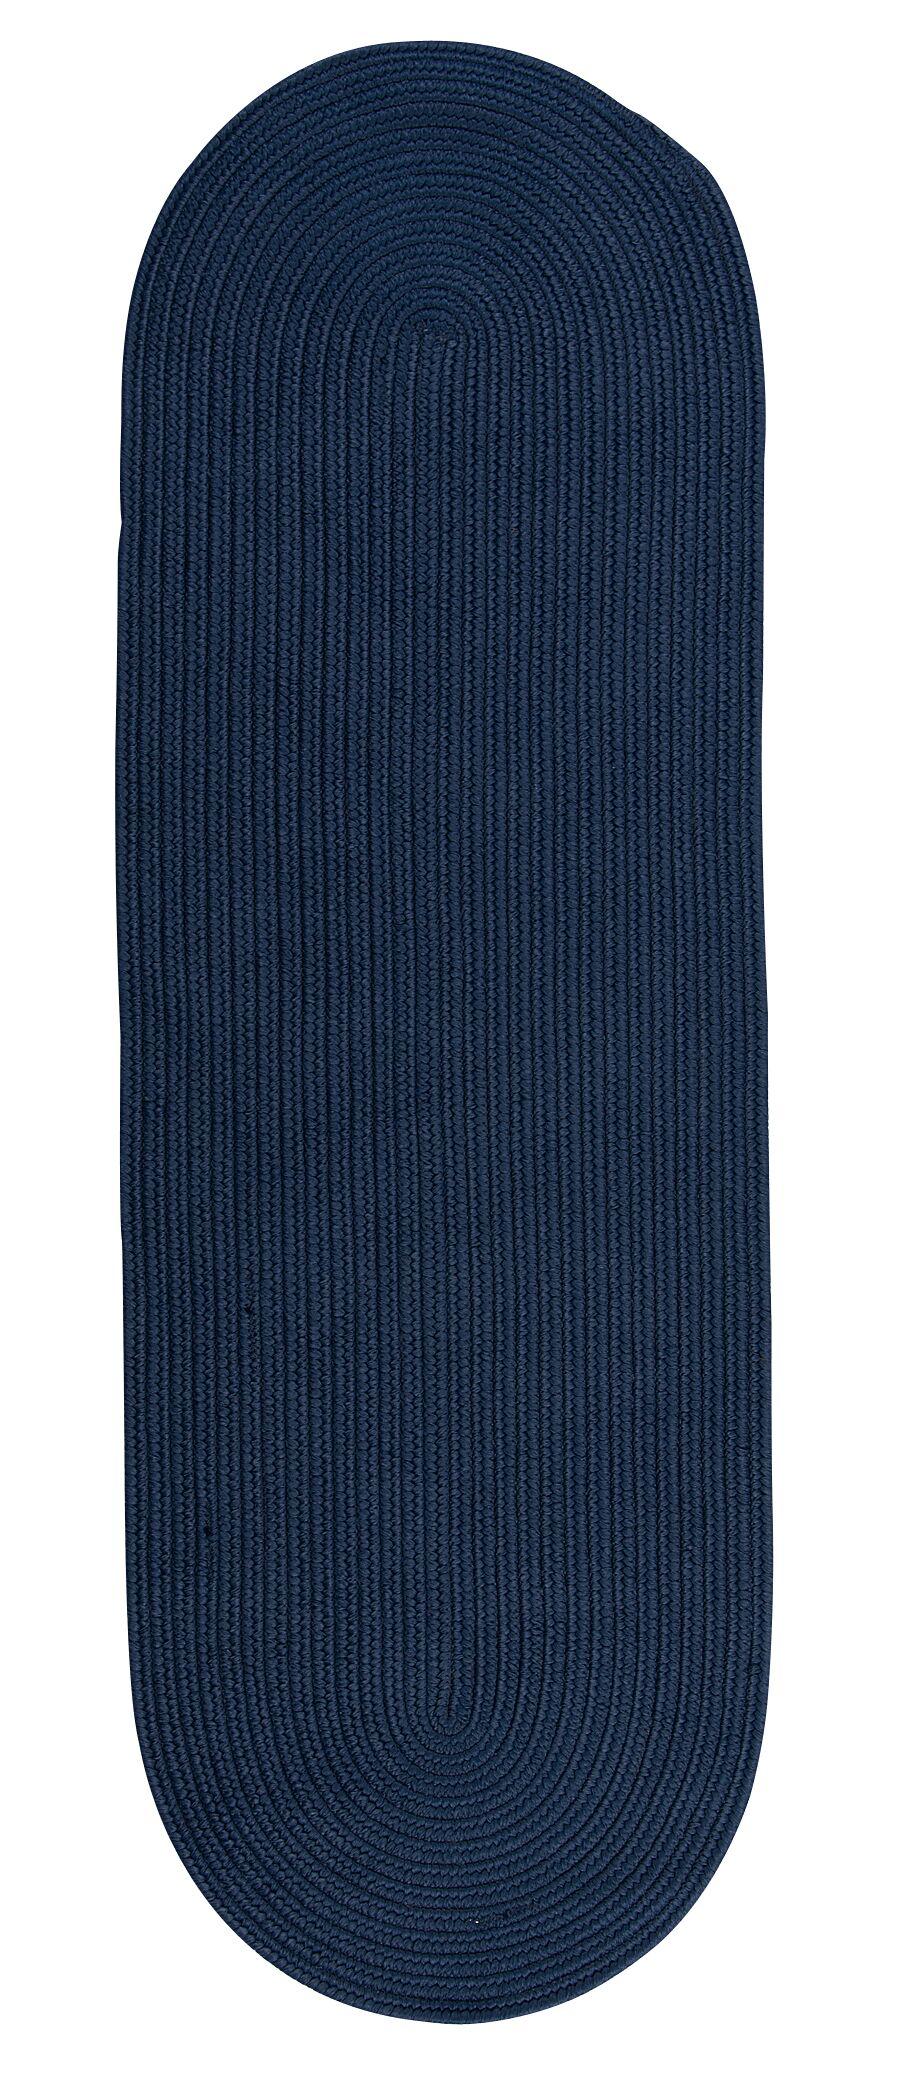 Wellings Reversible Hand-Braided Blue Indoor/Outdoor Area Rug Rug Size: Runner 2'4